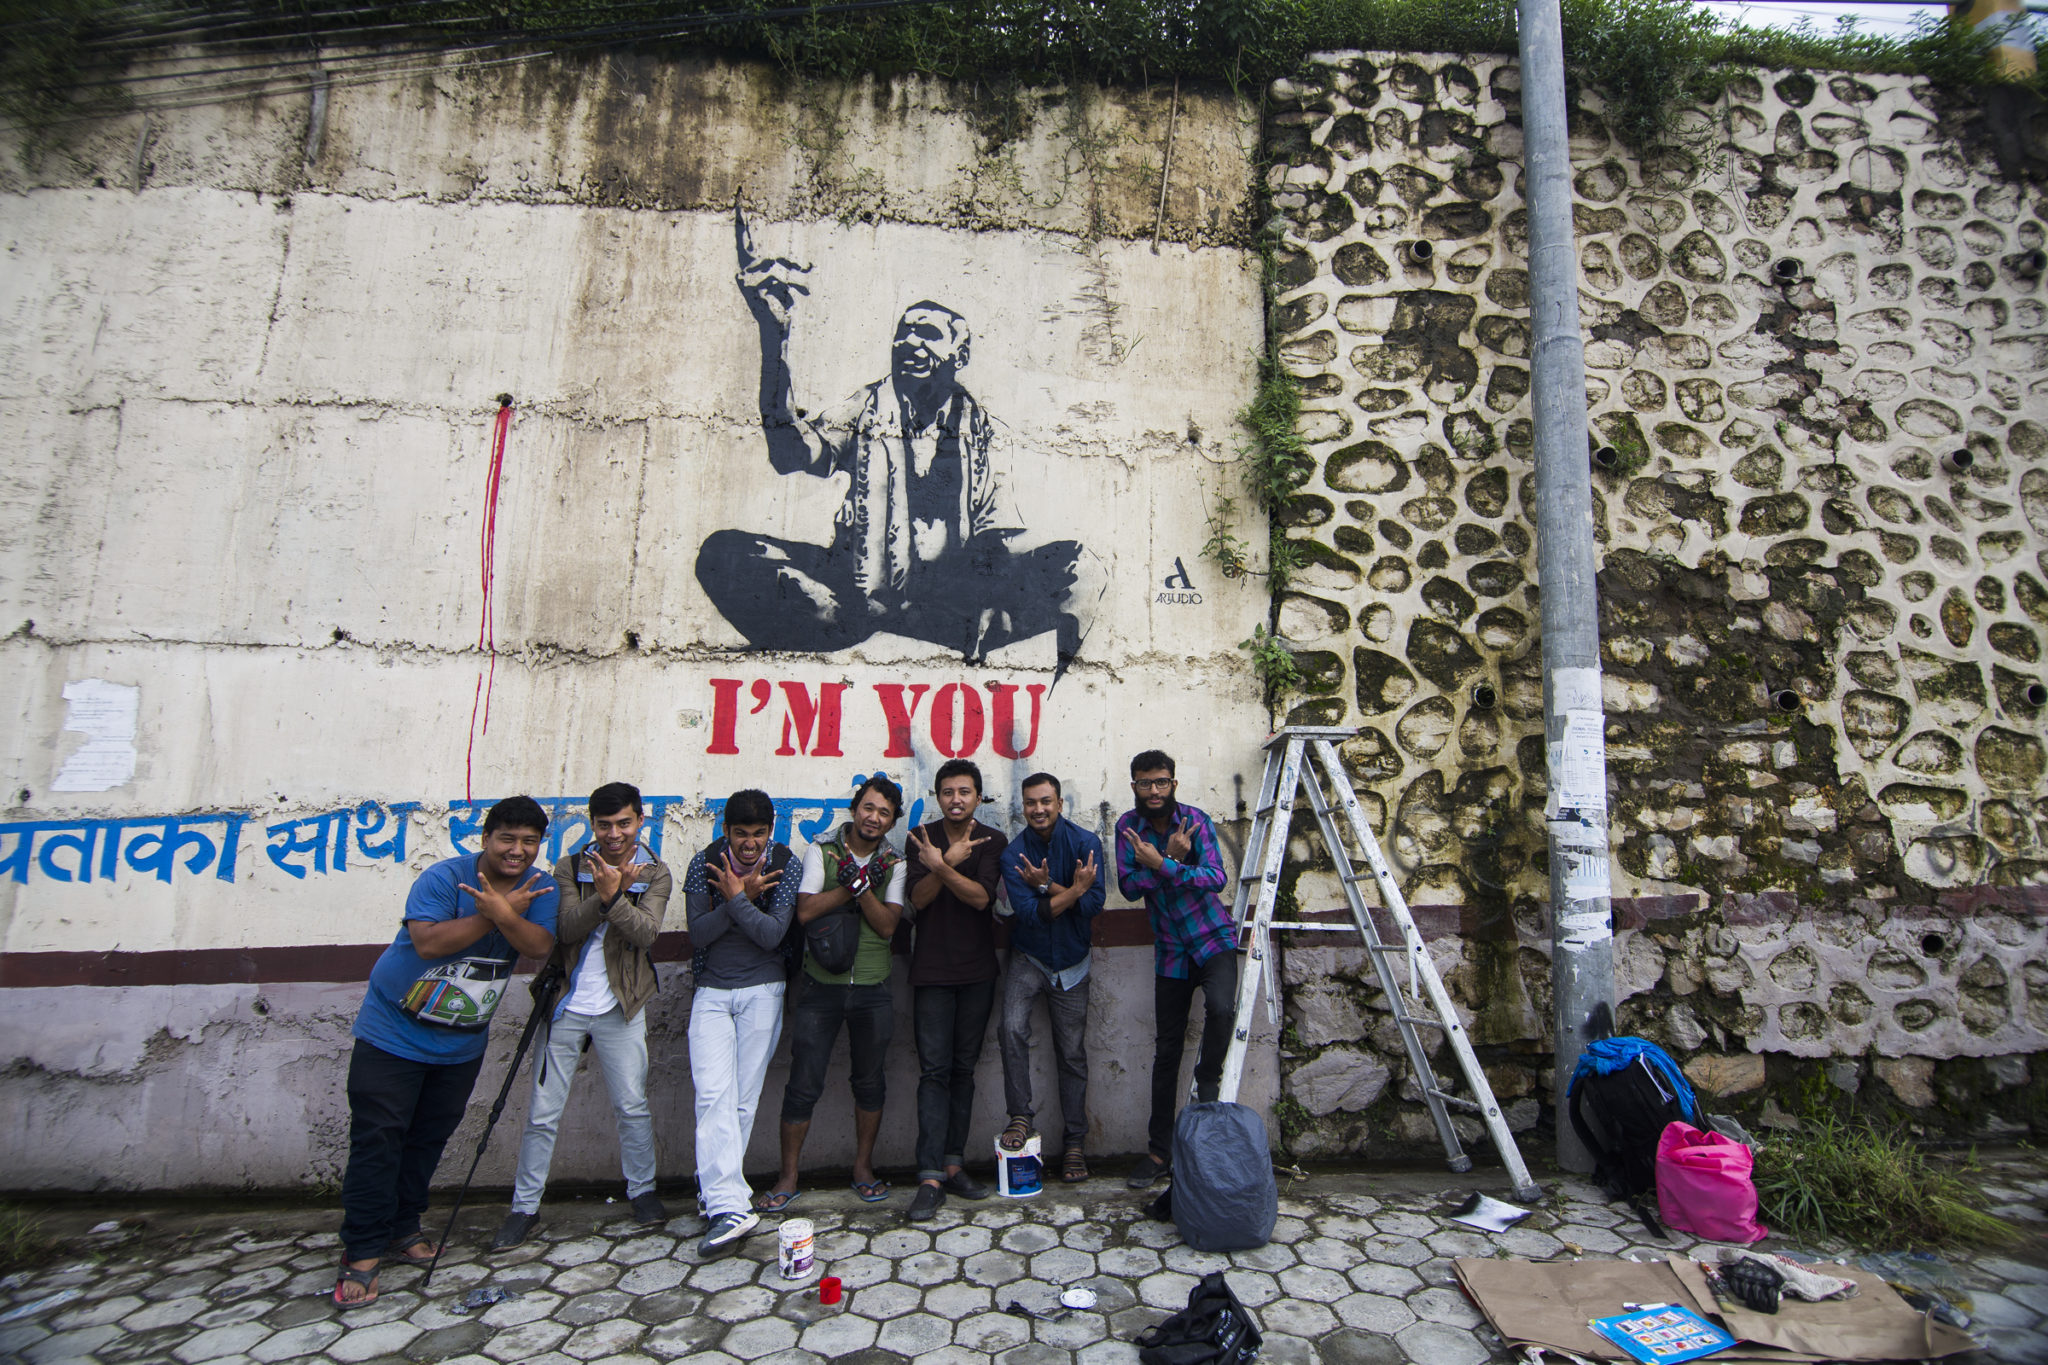 Artudio_I'M YOU_Street Art-Babarmahal (1)